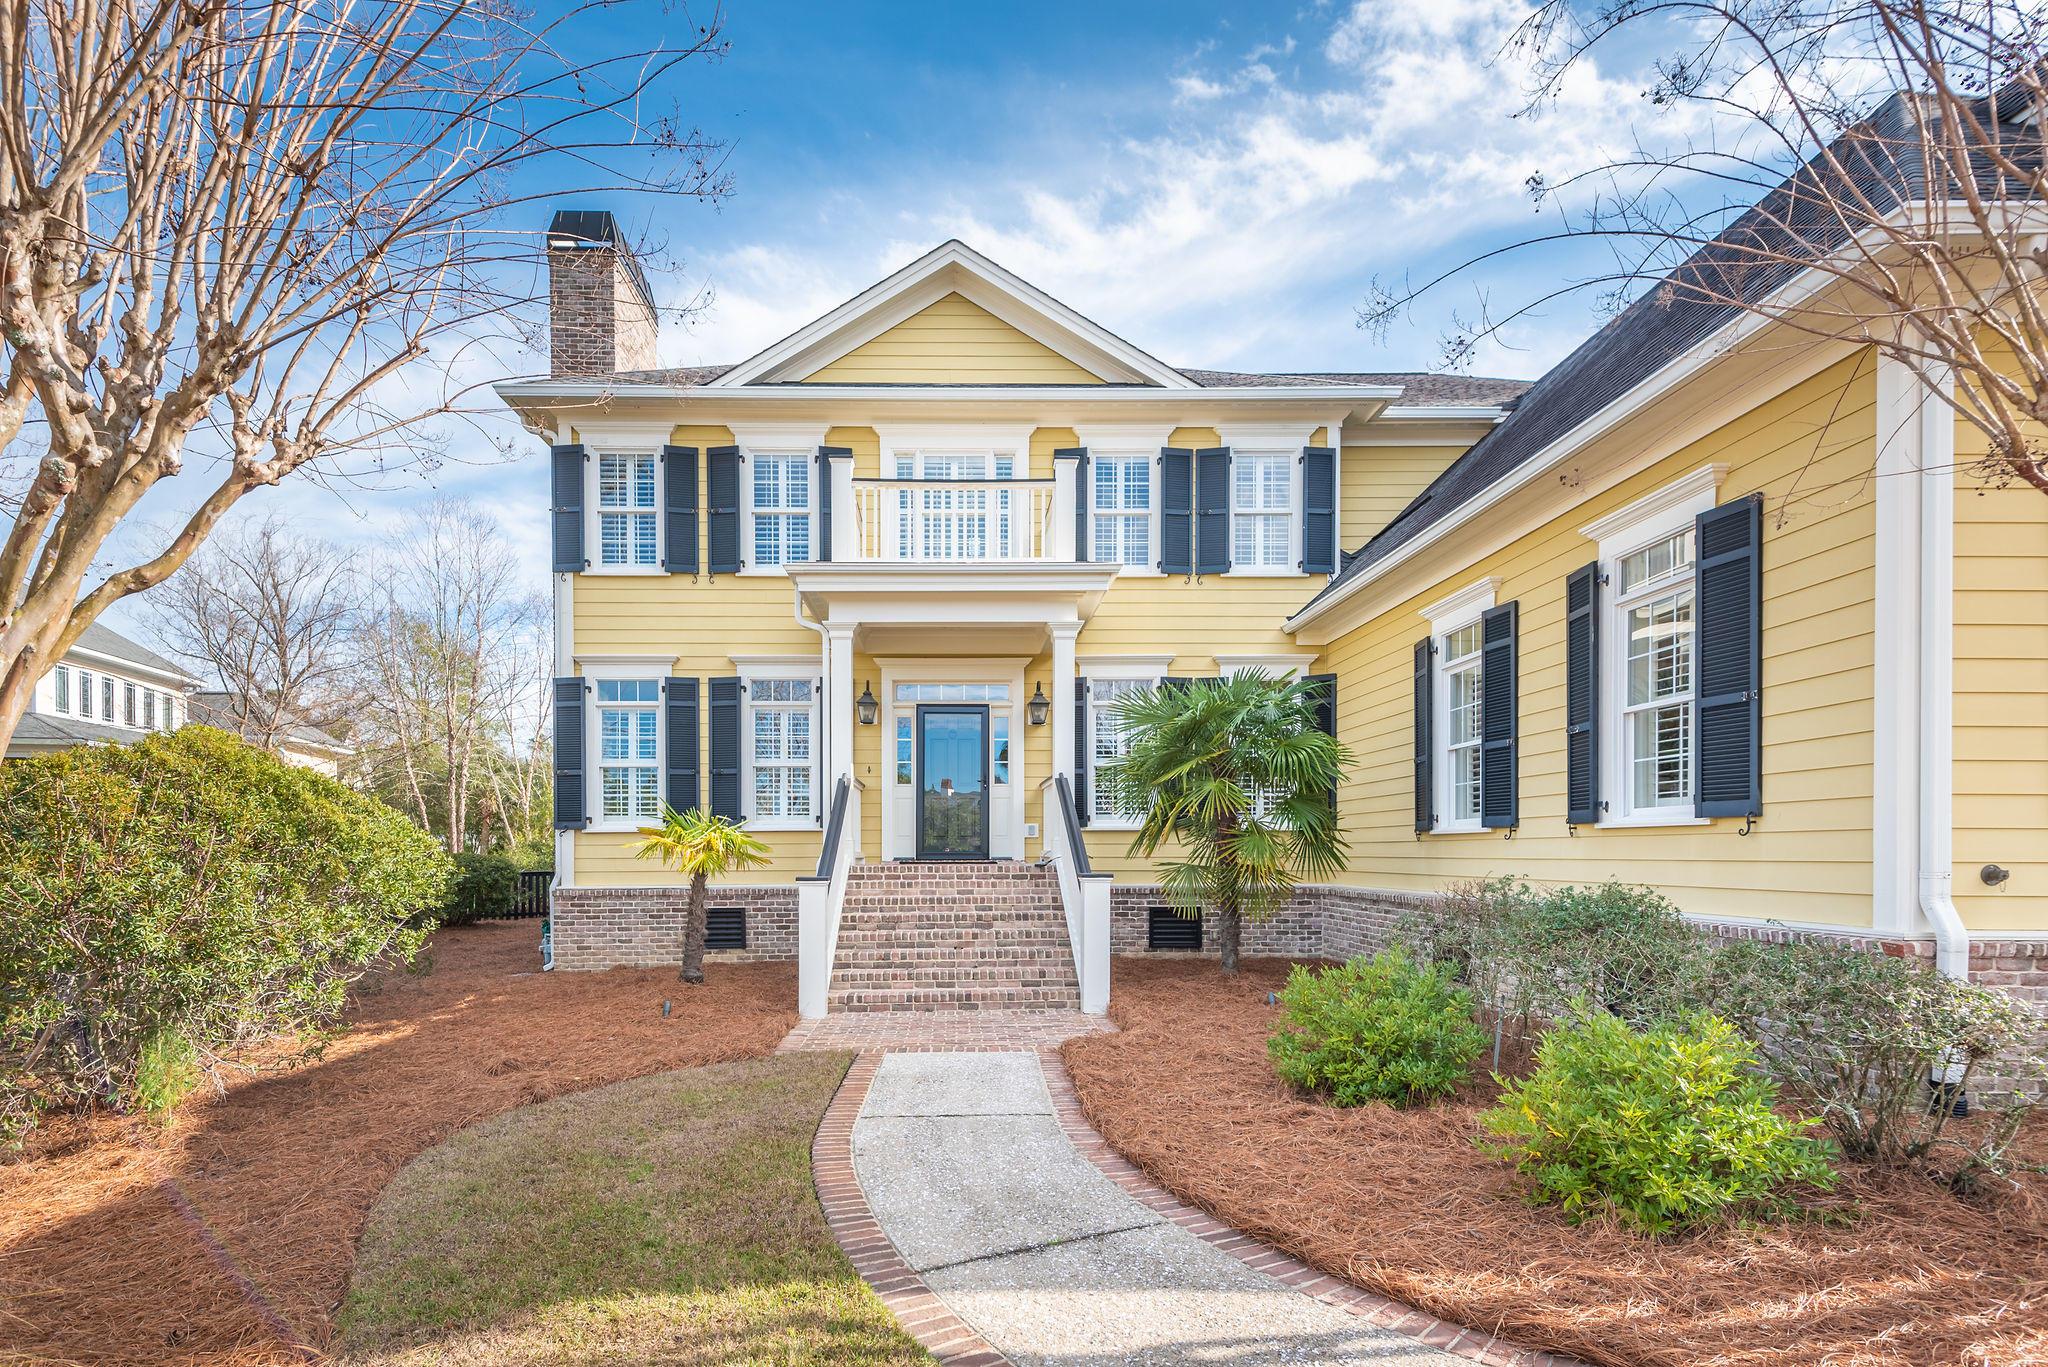 Dunes West Homes For Sale - 1305 King Bird, Mount Pleasant, SC - 40